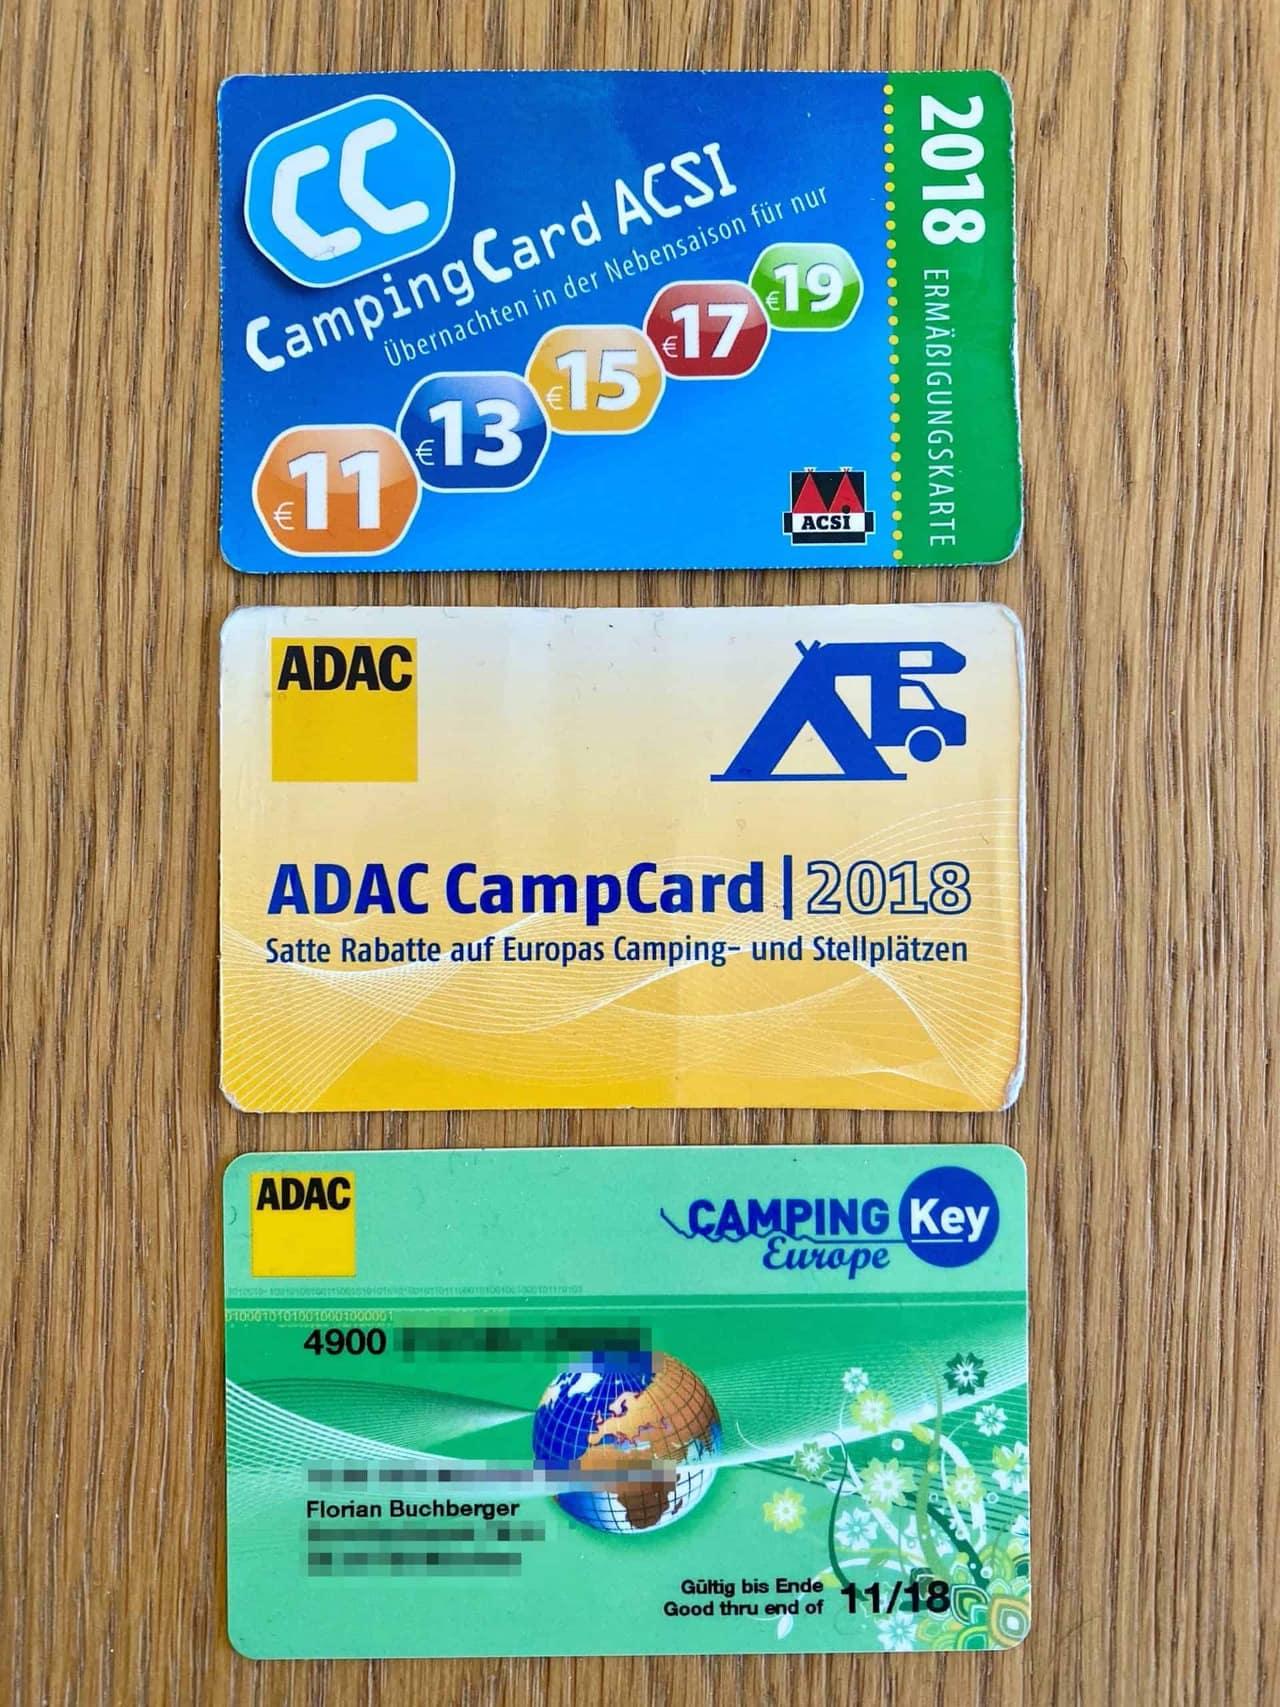 ADAC_ACSI_CKE_alle_Camping_Karten_2018